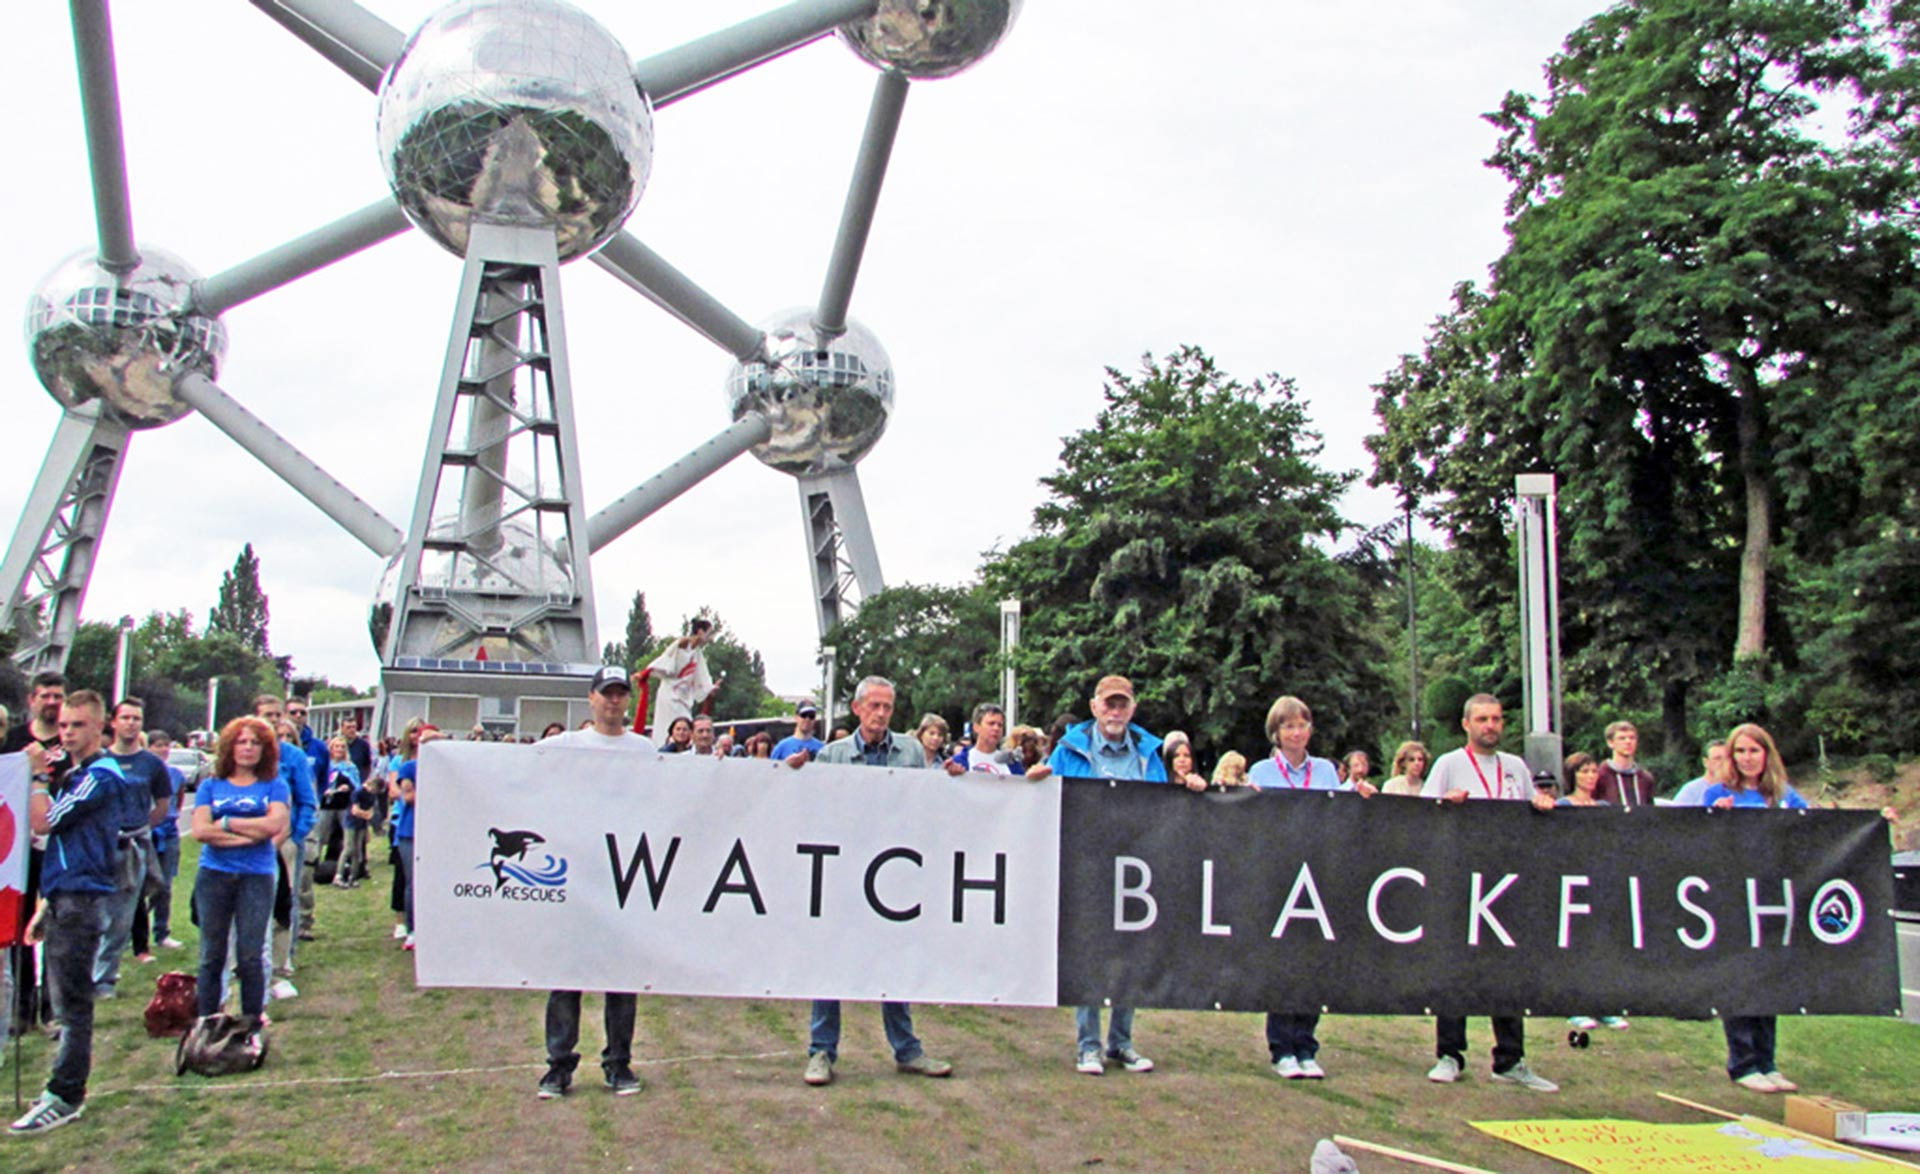 Belgium's Atomium made an impressive backdrop for the demonstration. Photo: Sasha Abdolmajid